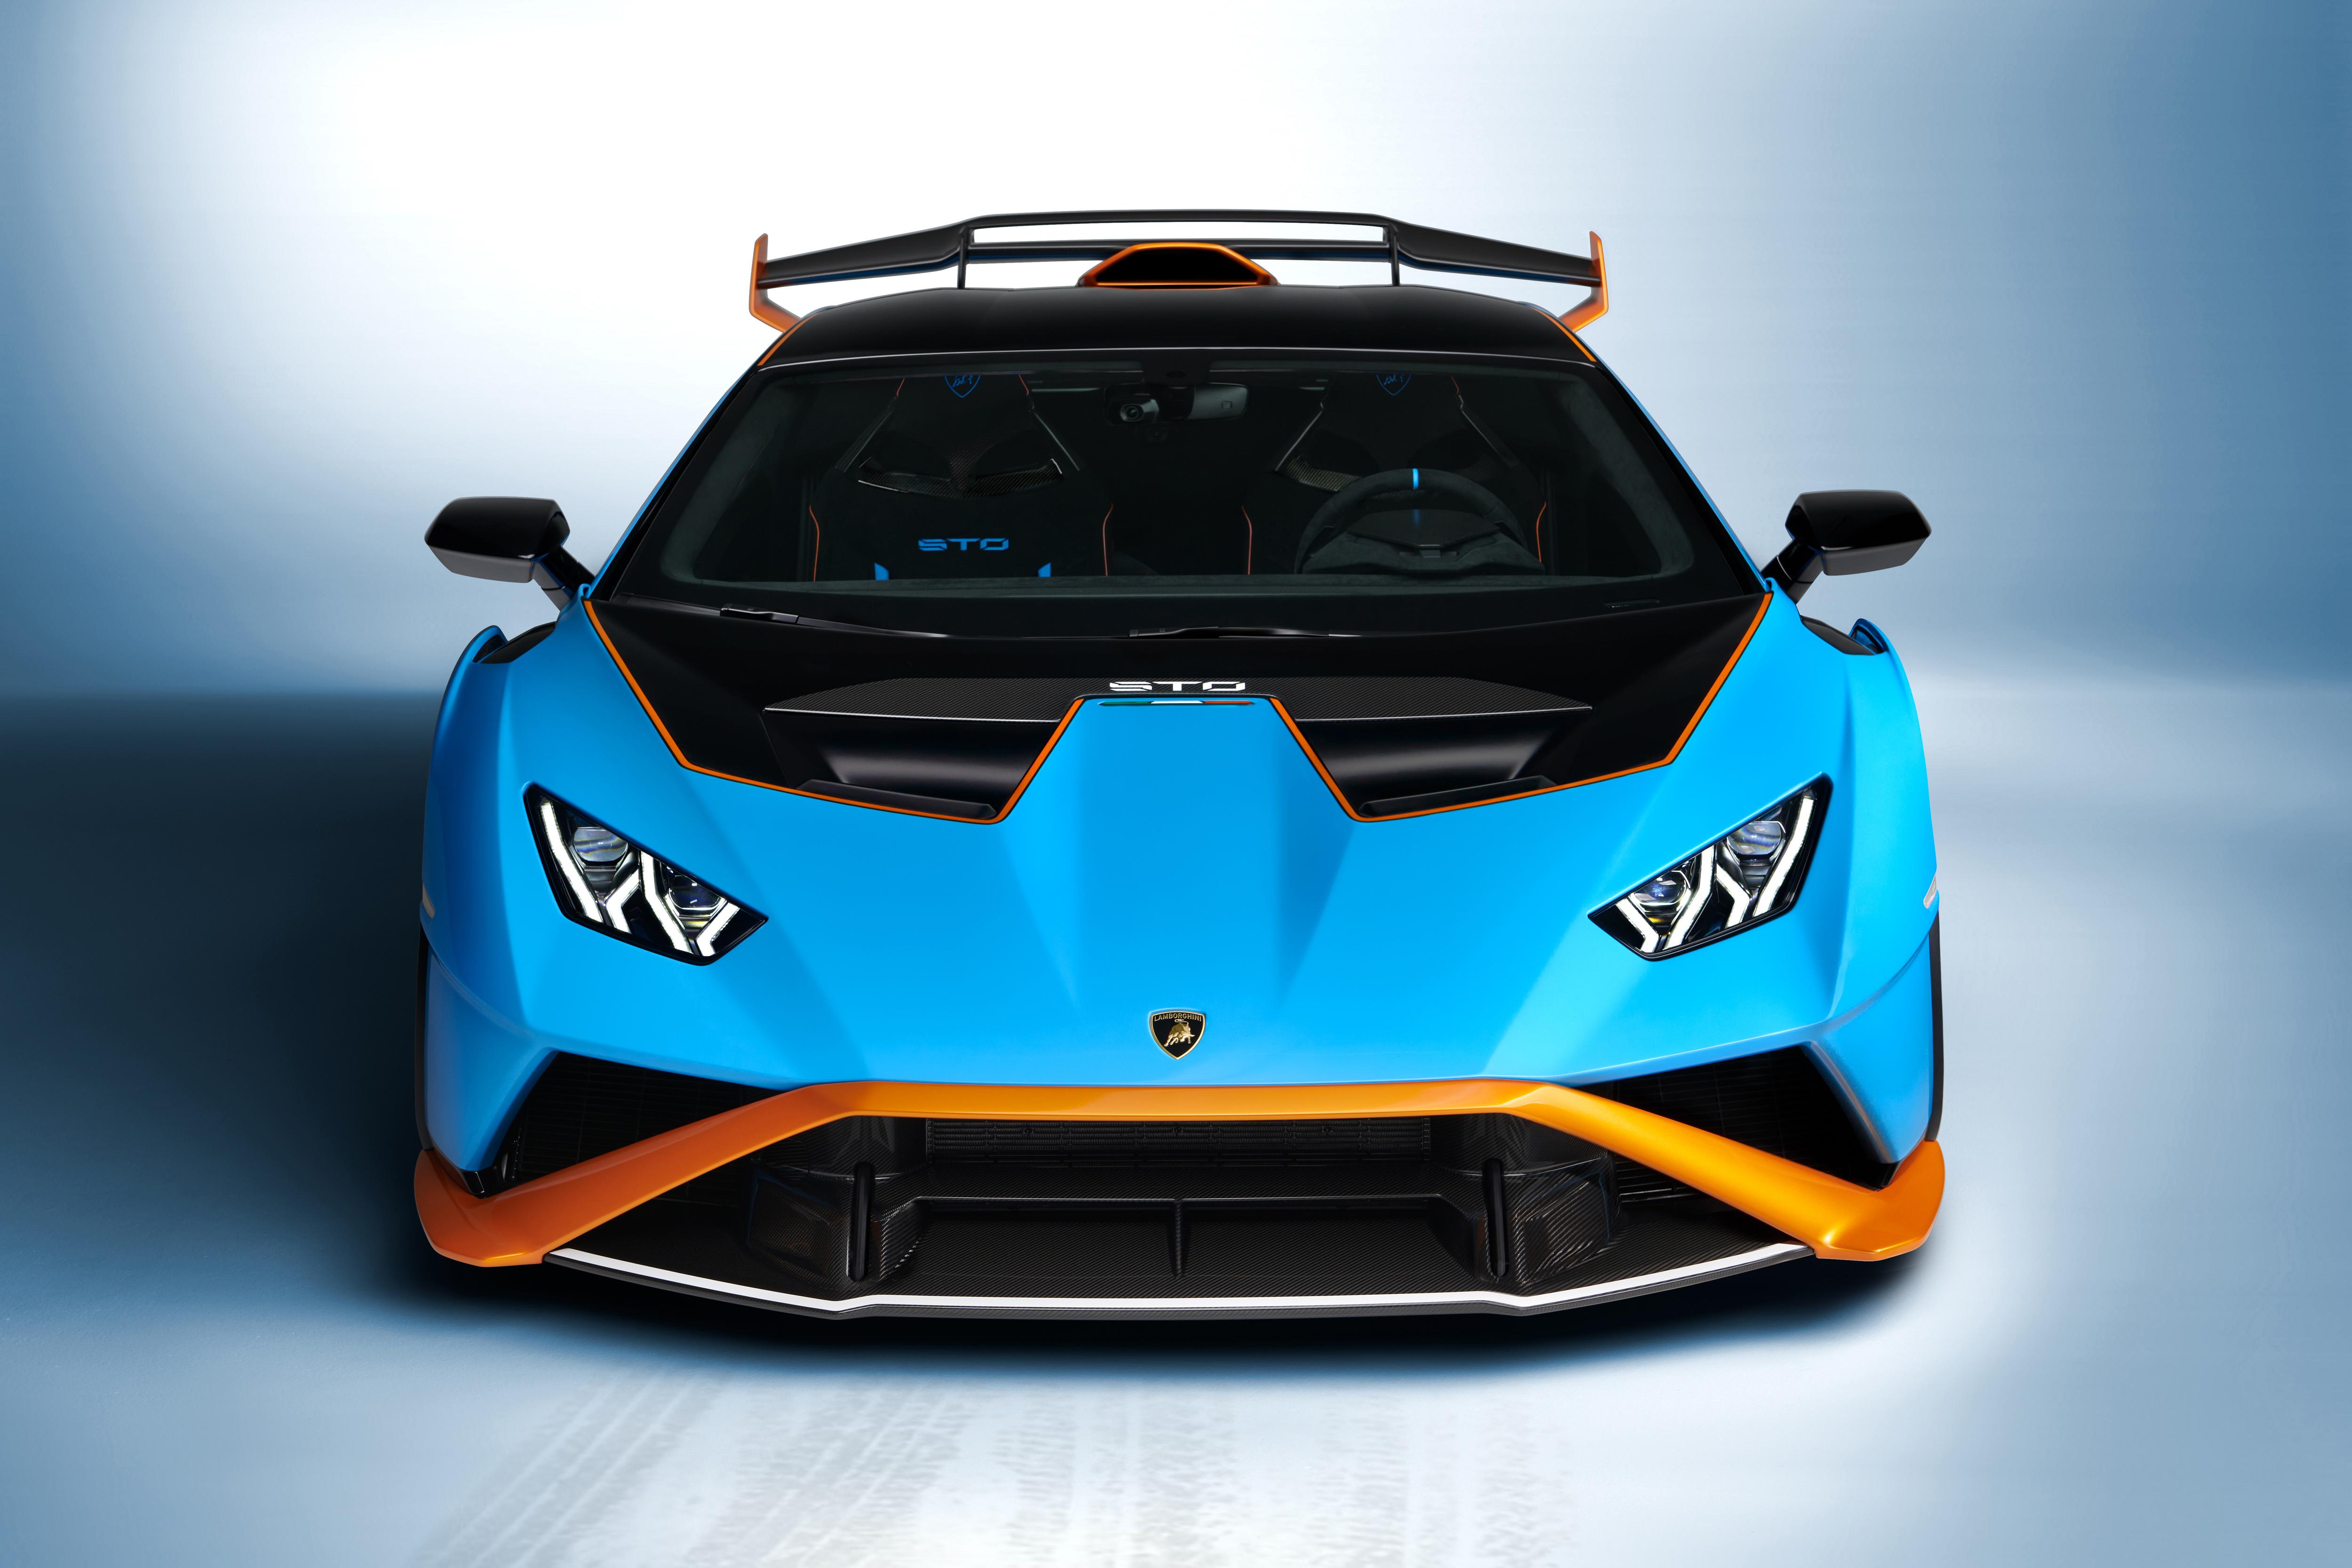 lamborghini huracan sto 2021 4k 1608980444 - Lamborghini Huracan Sto 2021 4k - Lamborghini Huracan Sto 2021 4k wallpapers